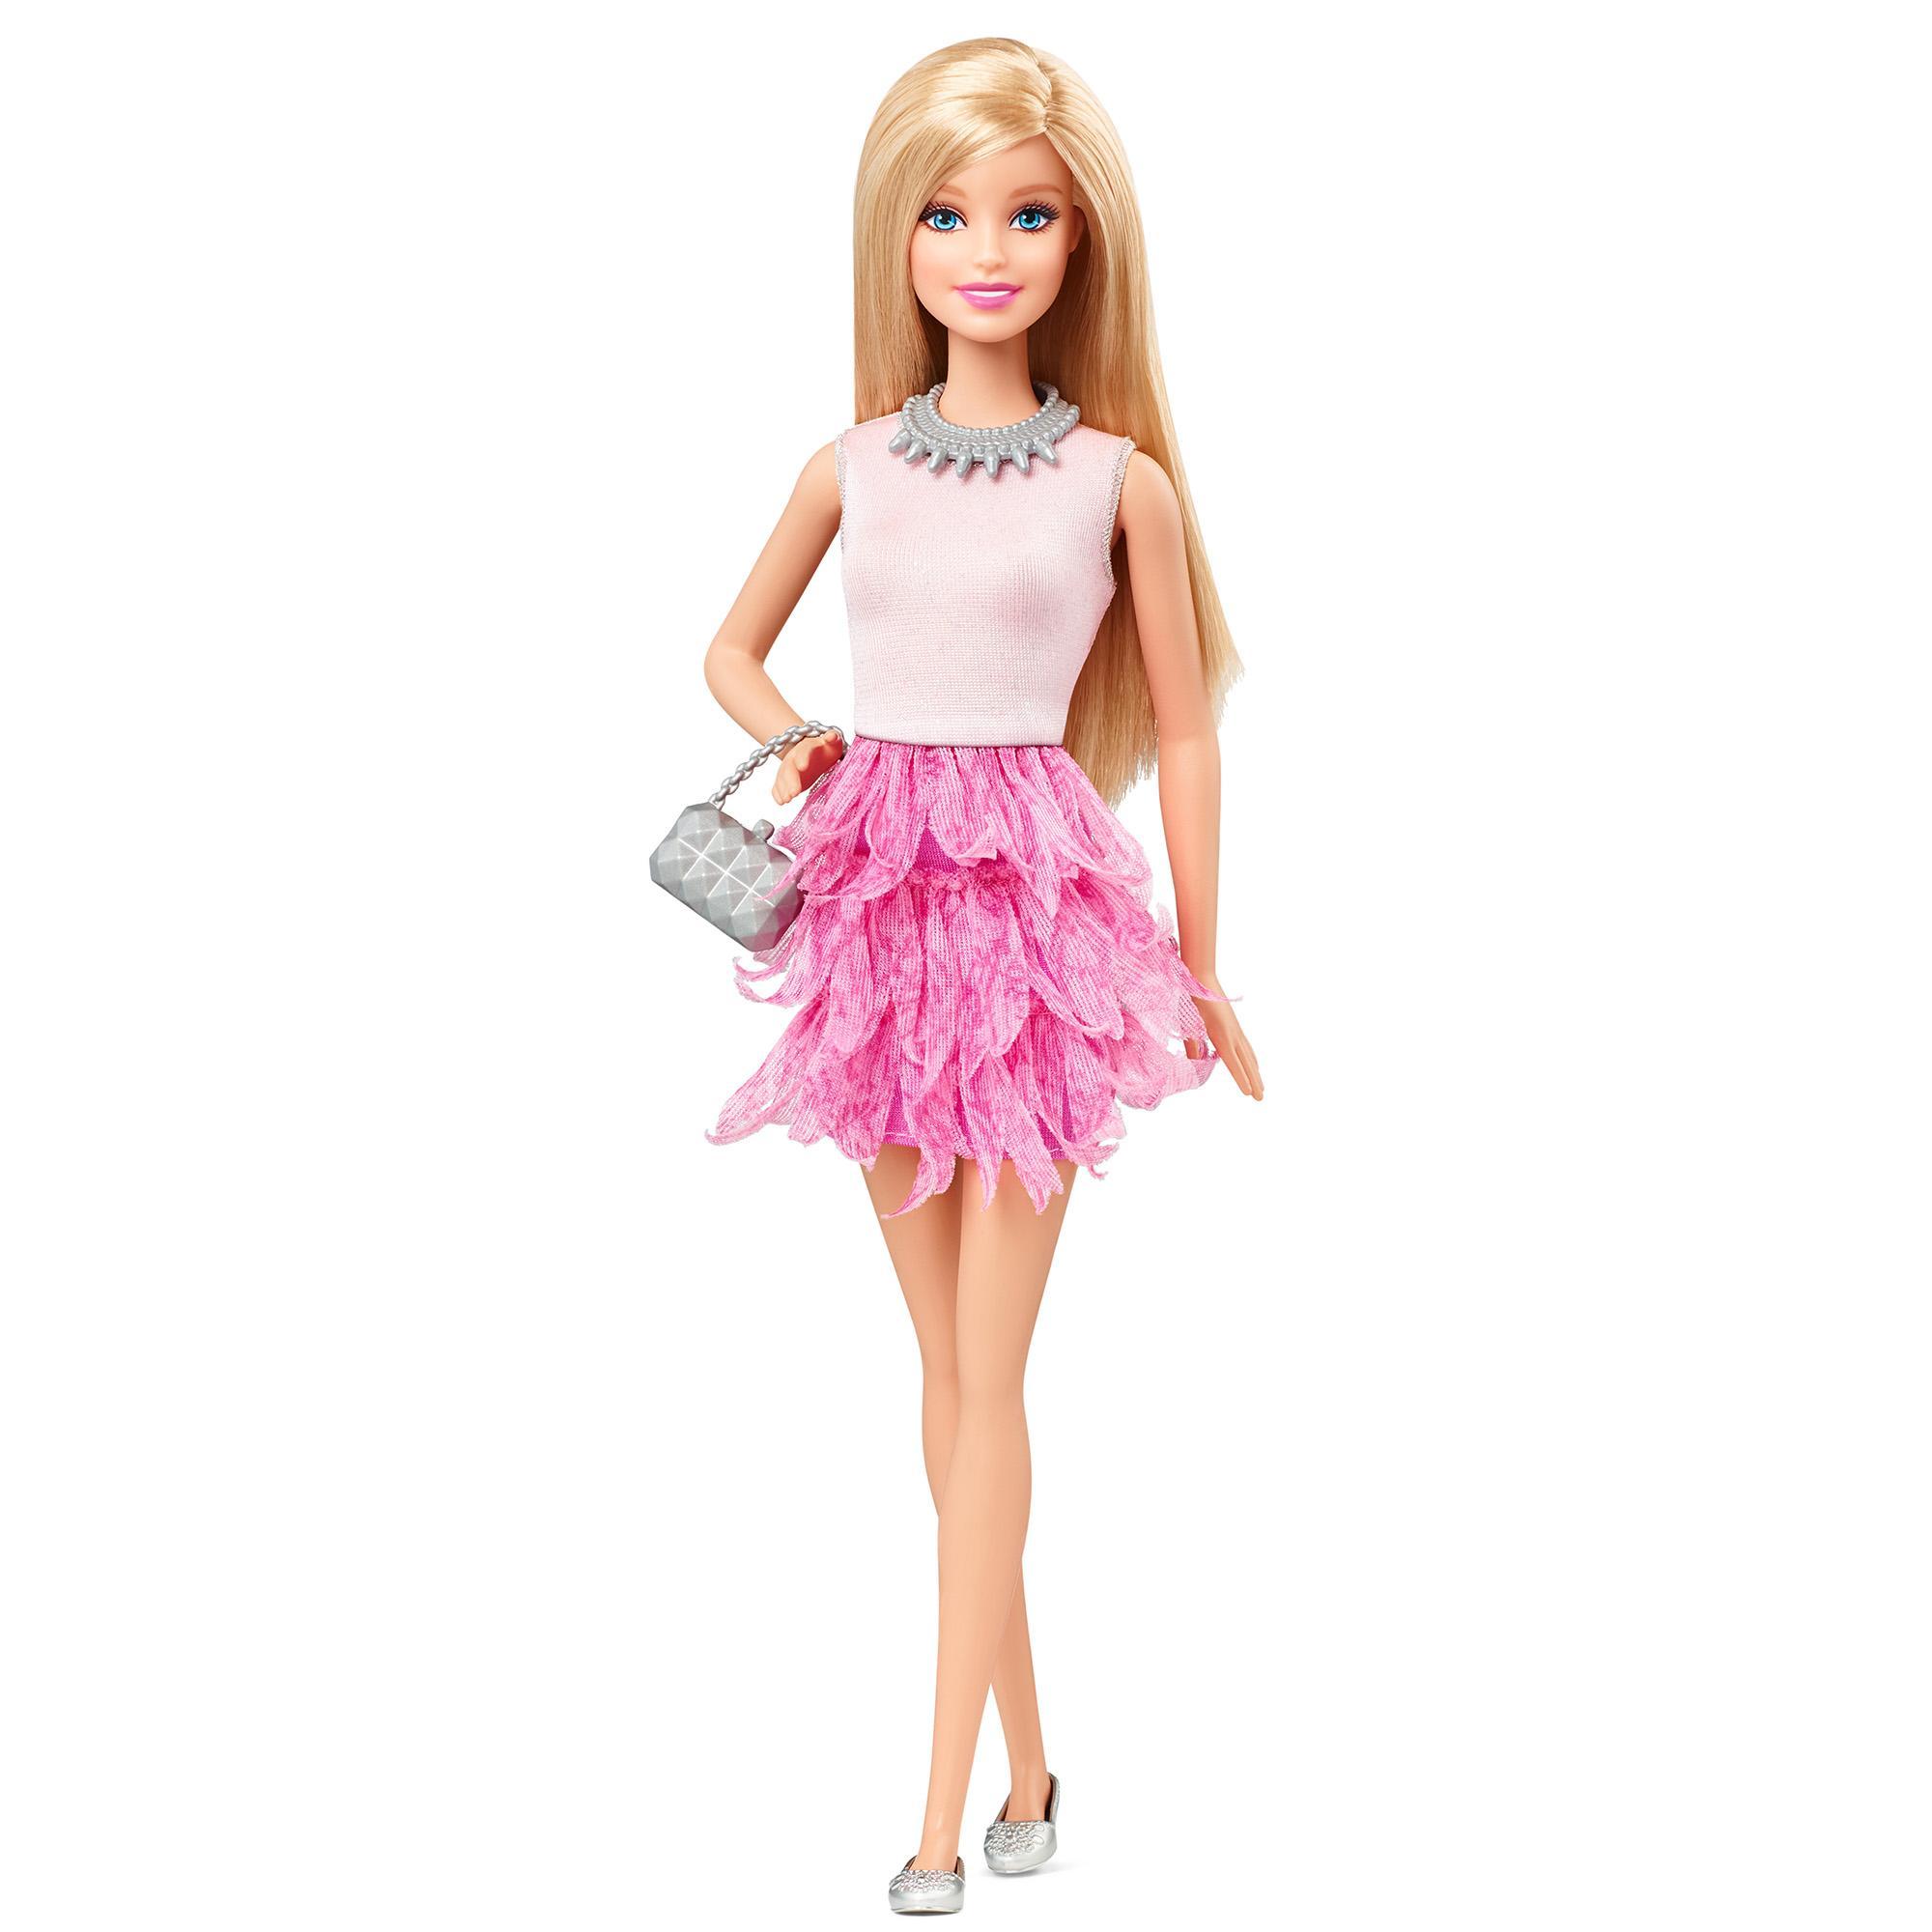 2000x2000 > Barbie Wallpapers